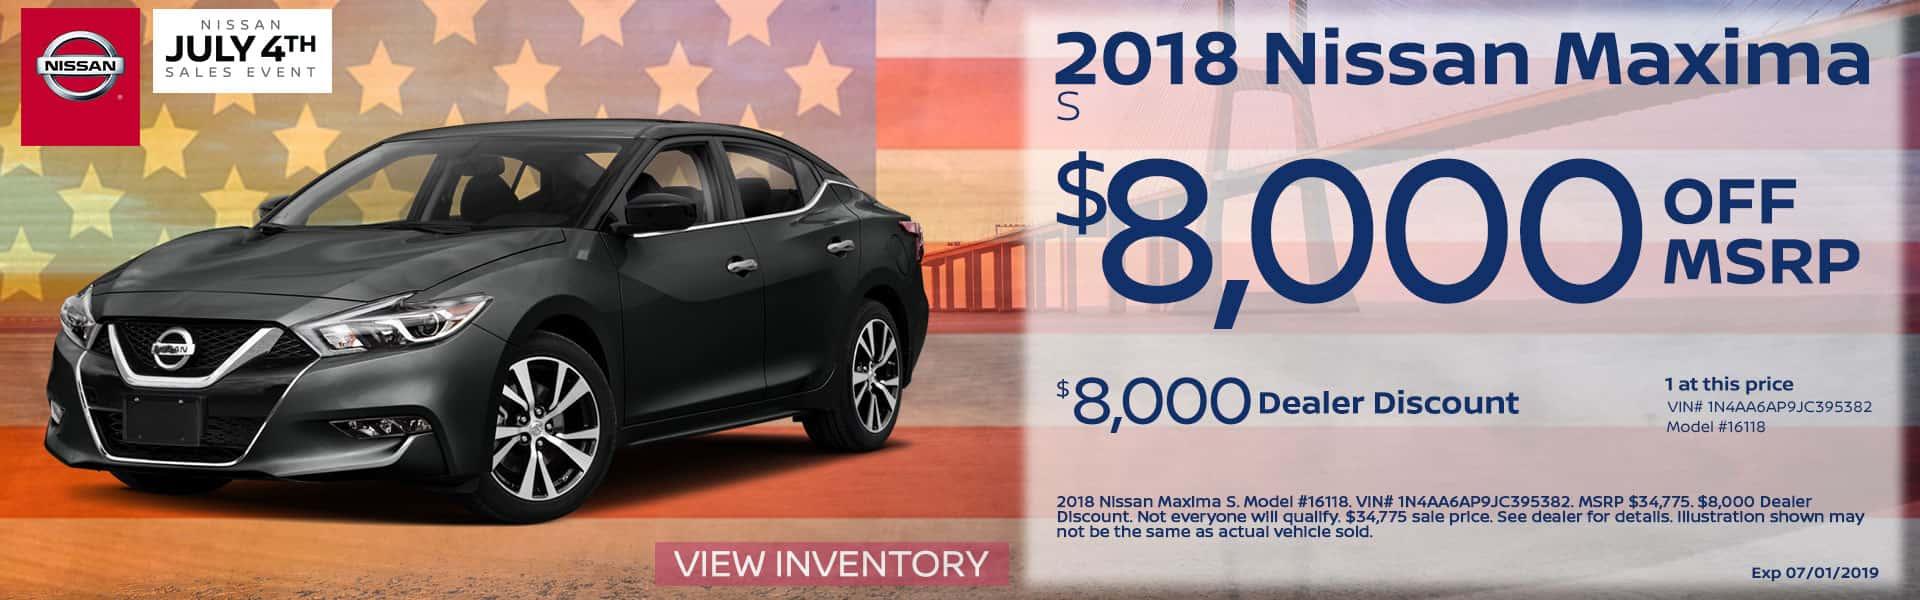 2018 Nissan Maxima Special